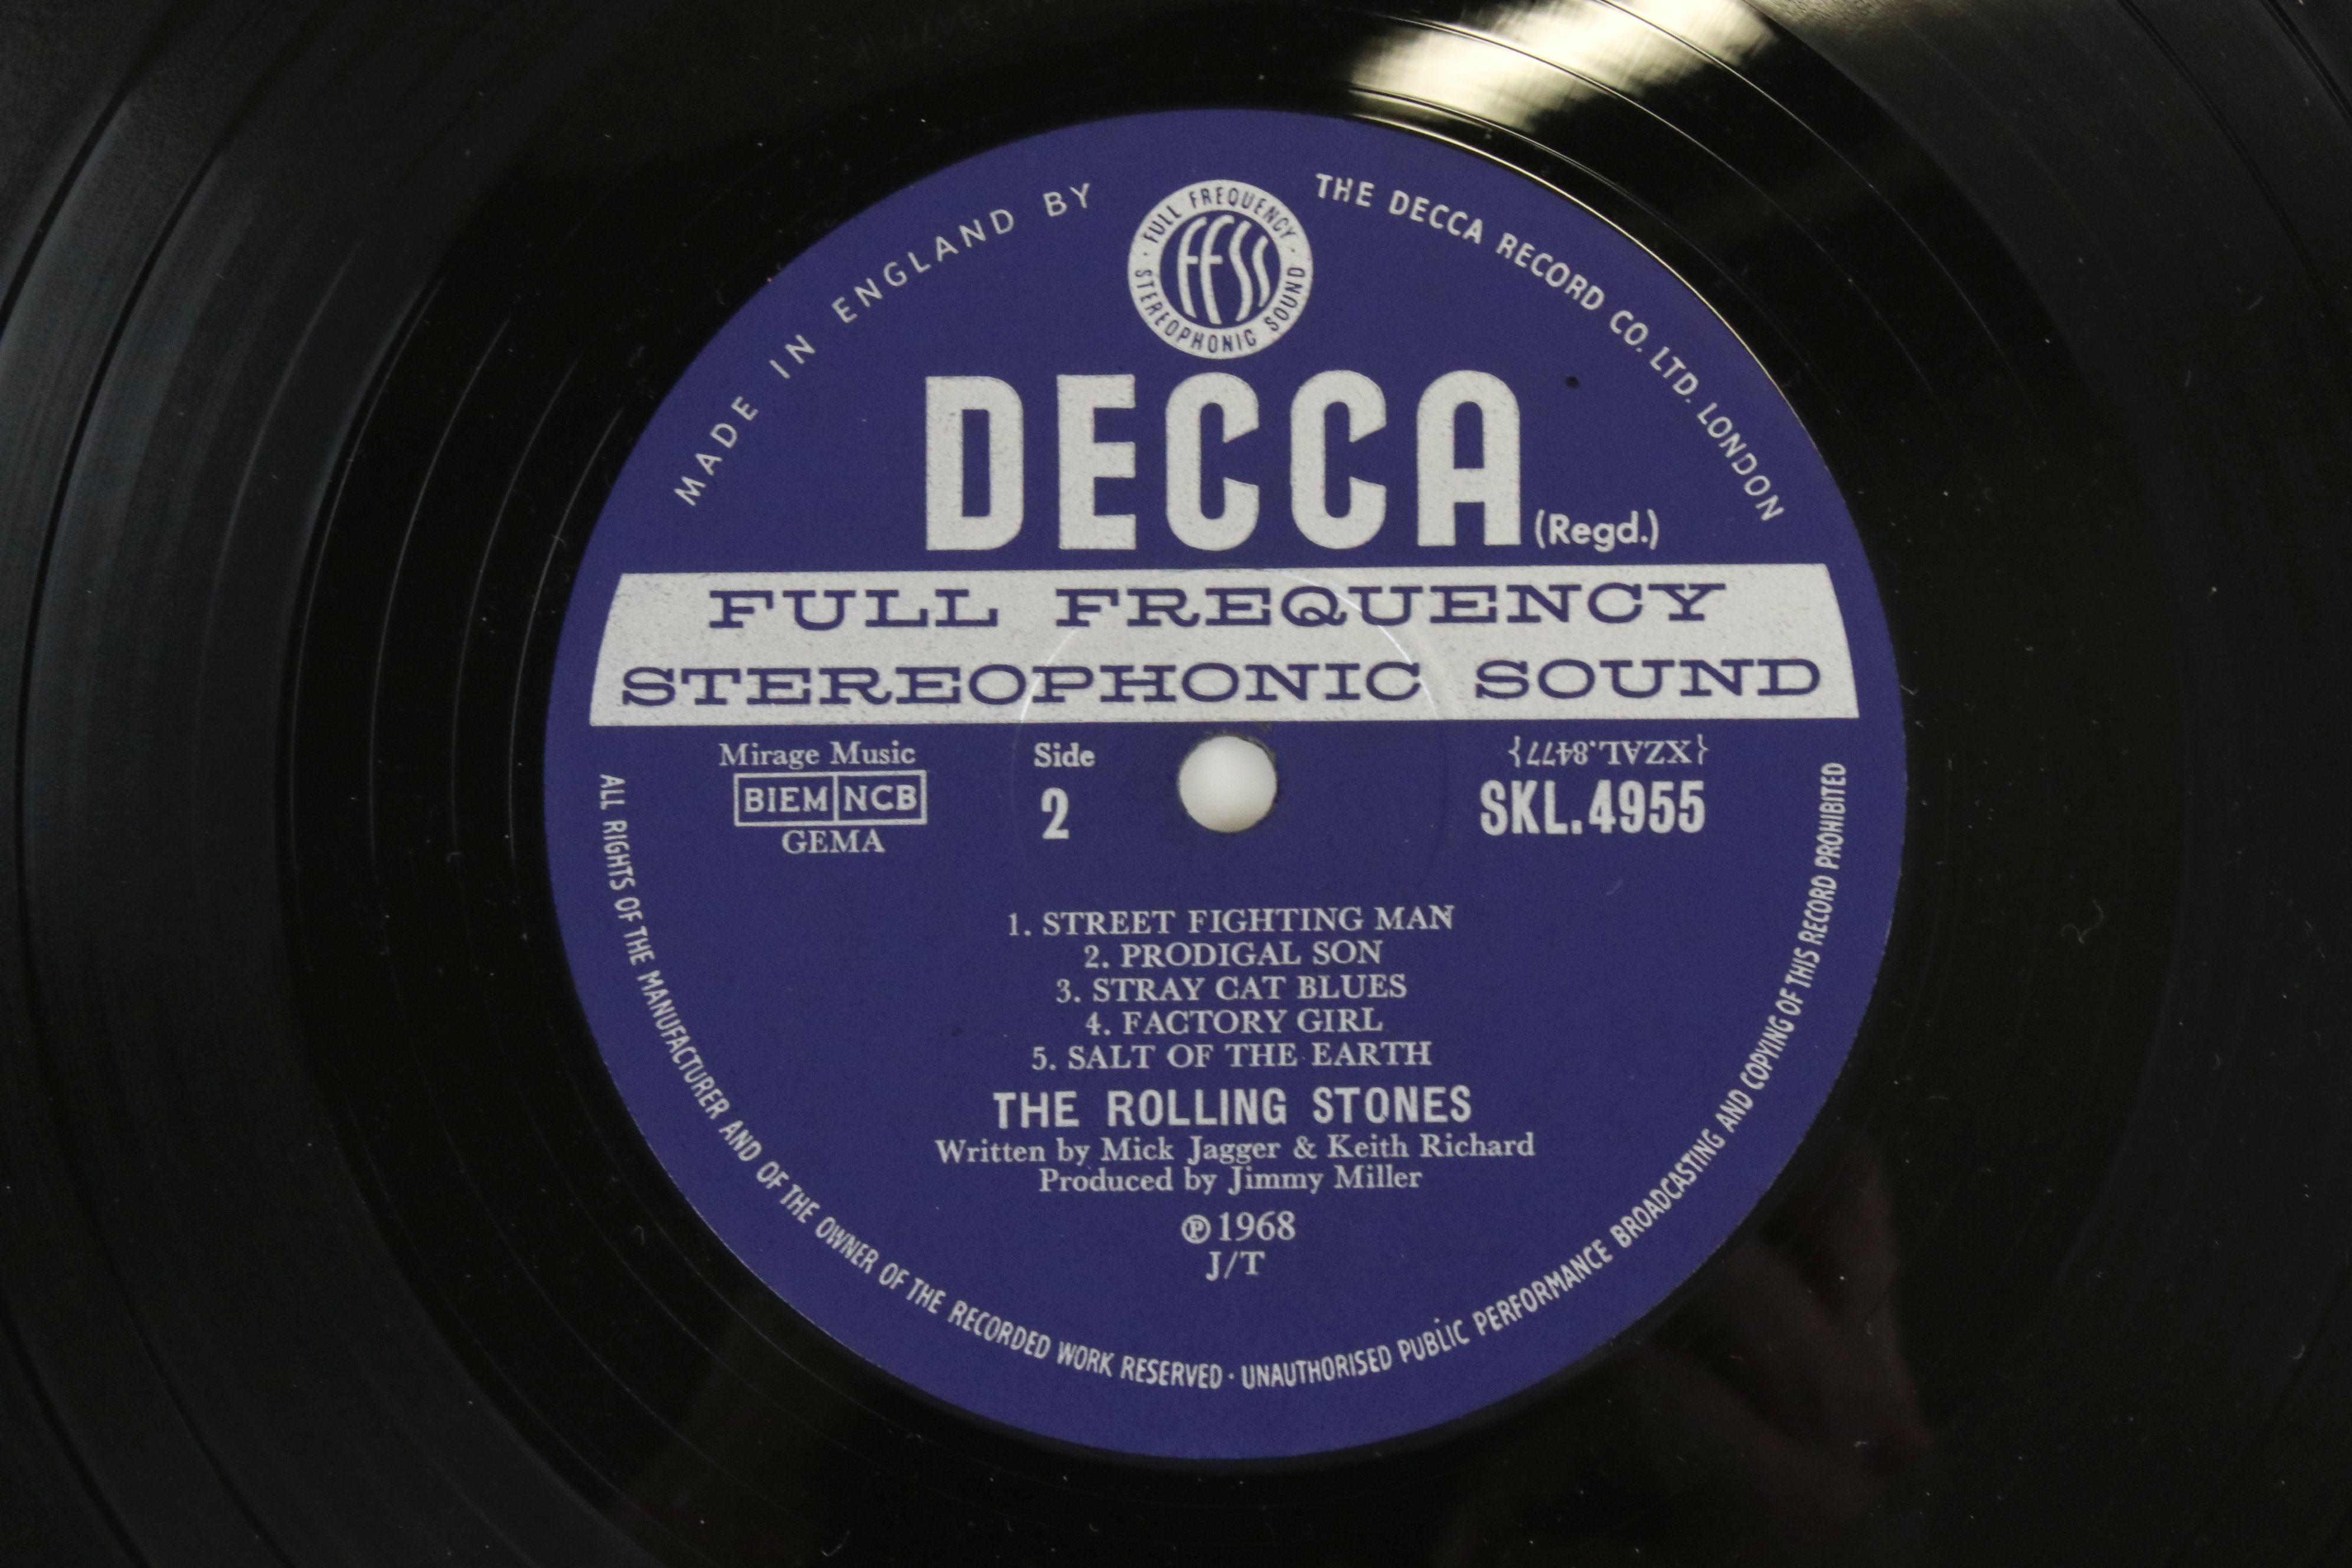 Vinyl - The Rolling Stones Beggars Banquet (SKL 4955) blue Decca label, Mirage Music, titles - Image 4 of 6